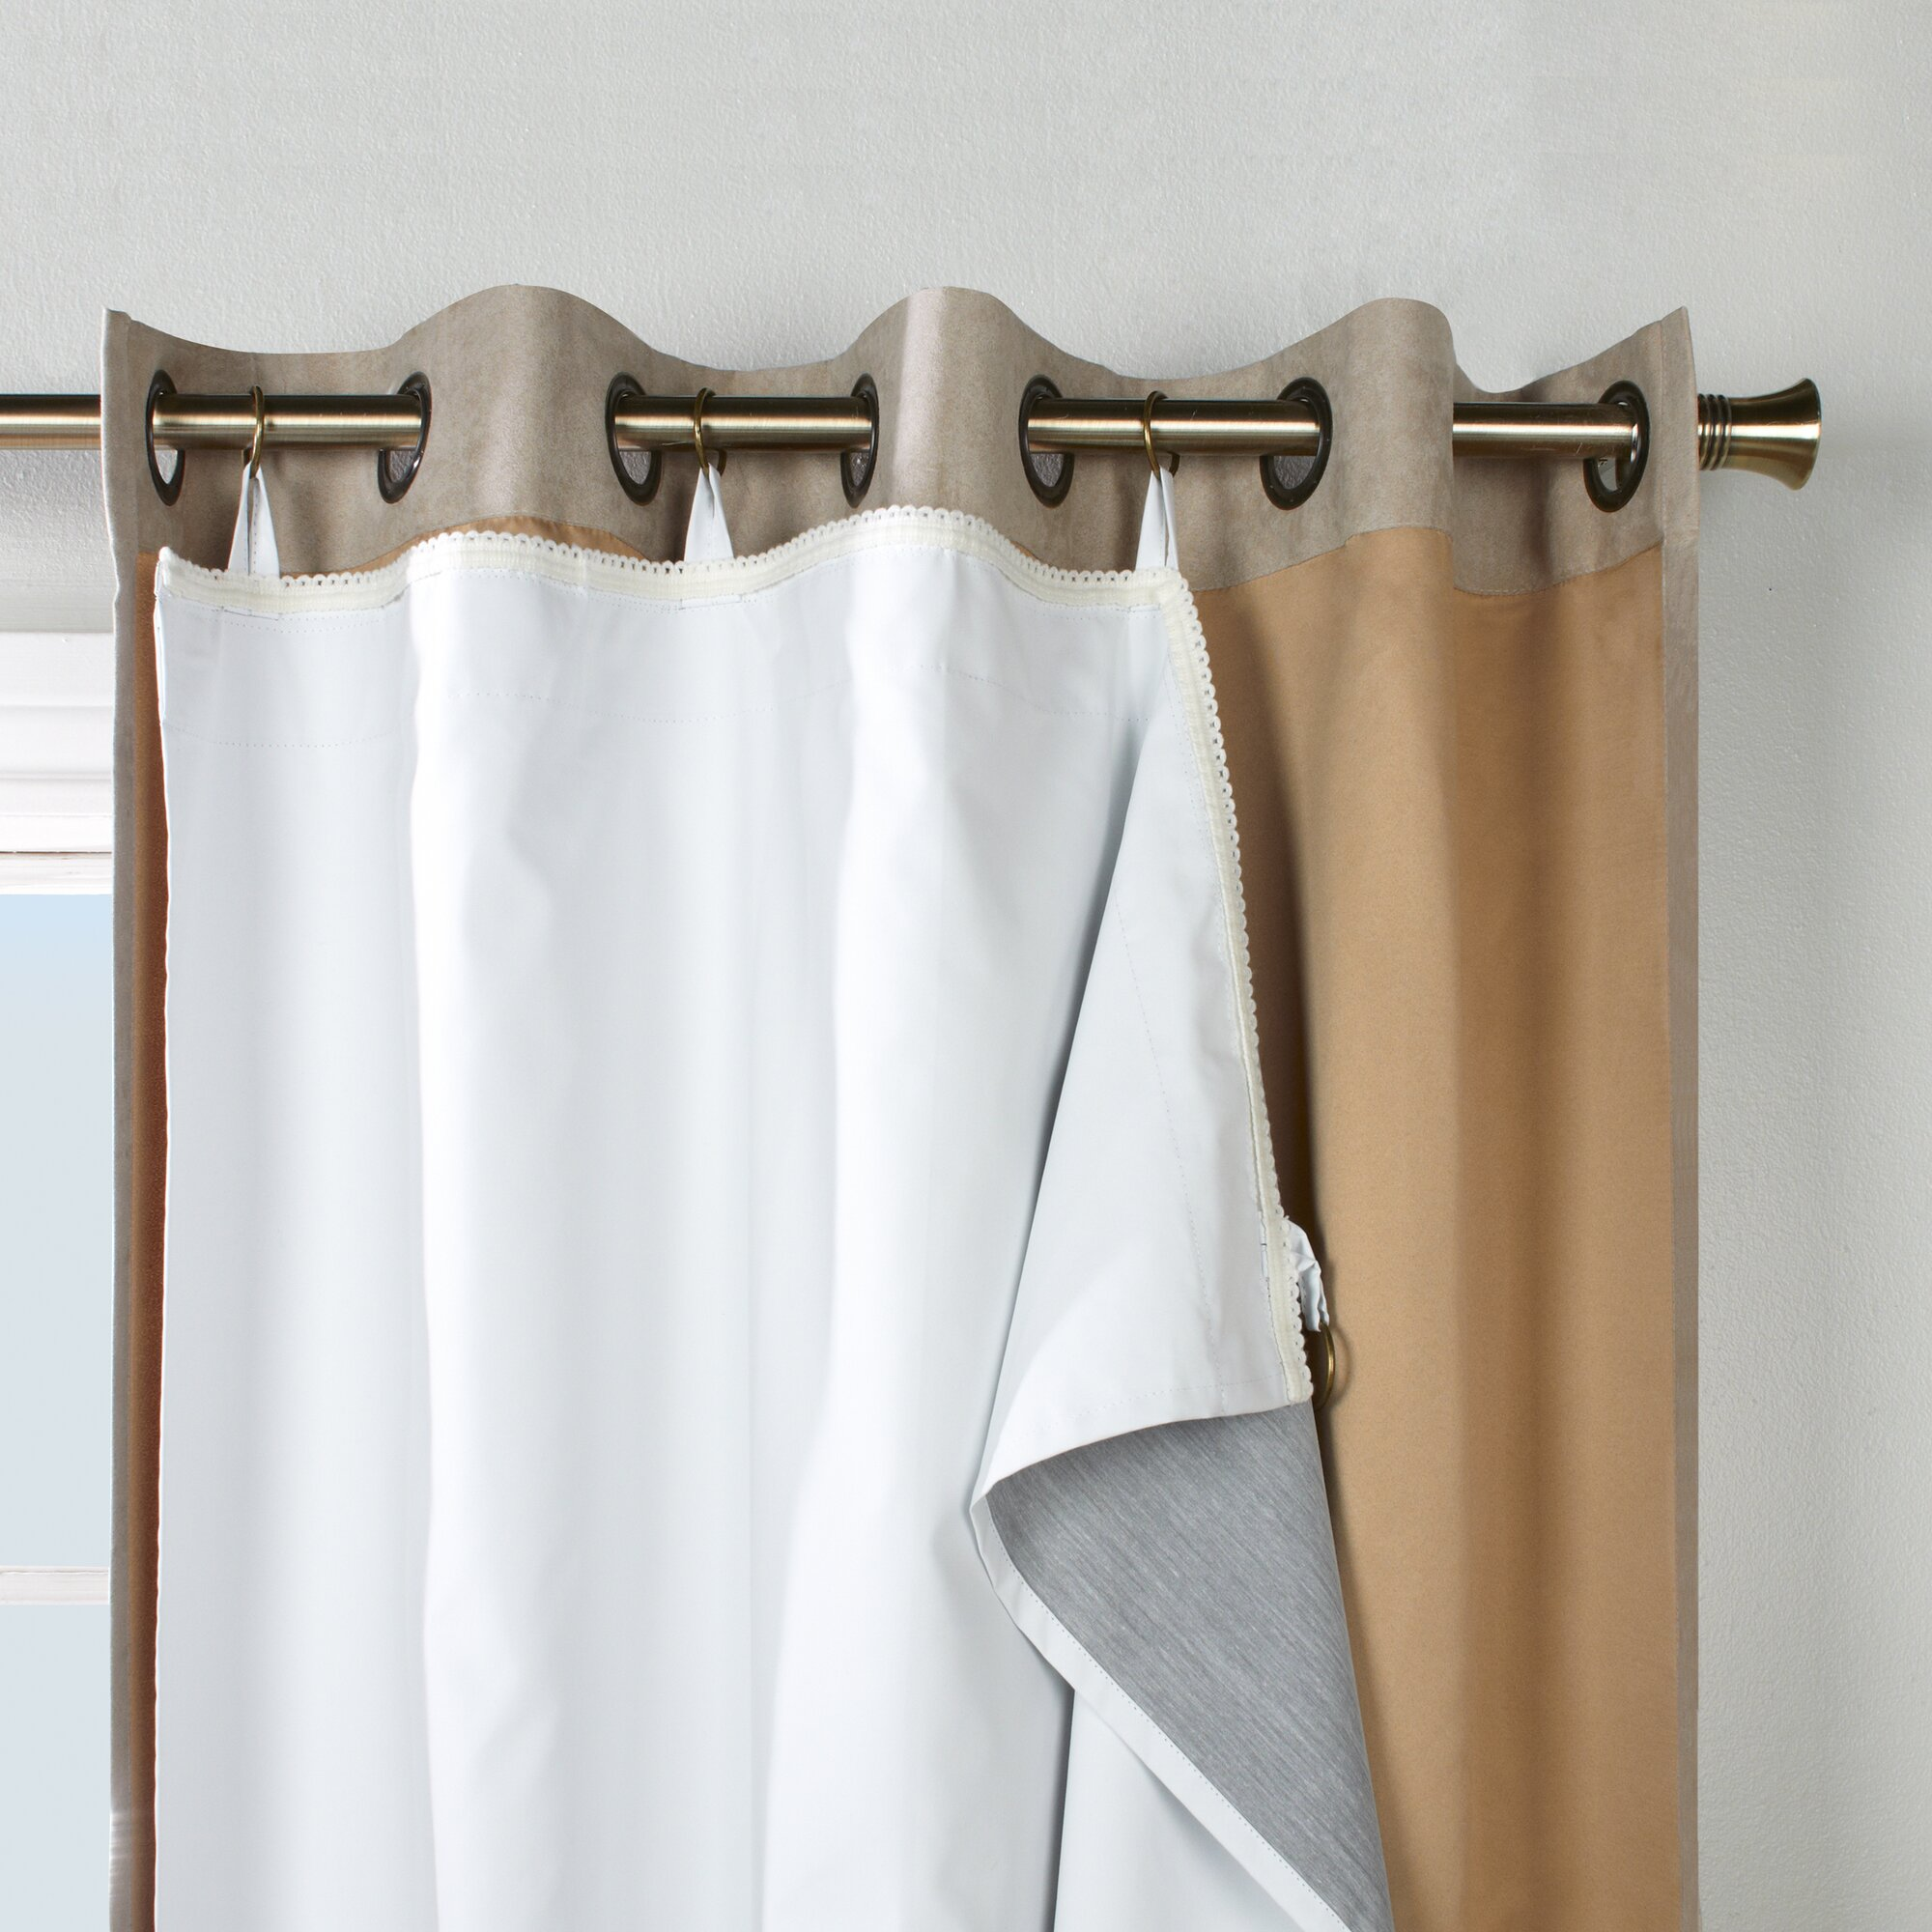 Alcott Hill Dorset Solid Sheer Thermal Grommet Curtain